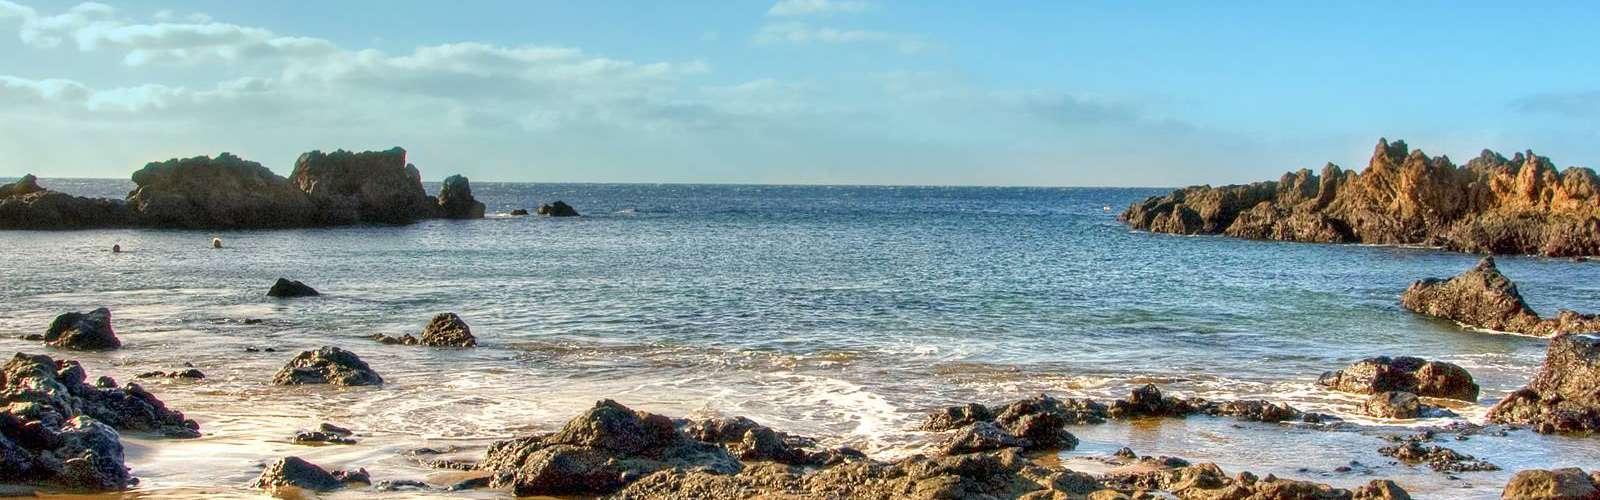 Lanzarote Tourism | Club Siroco Apartments - Official Site